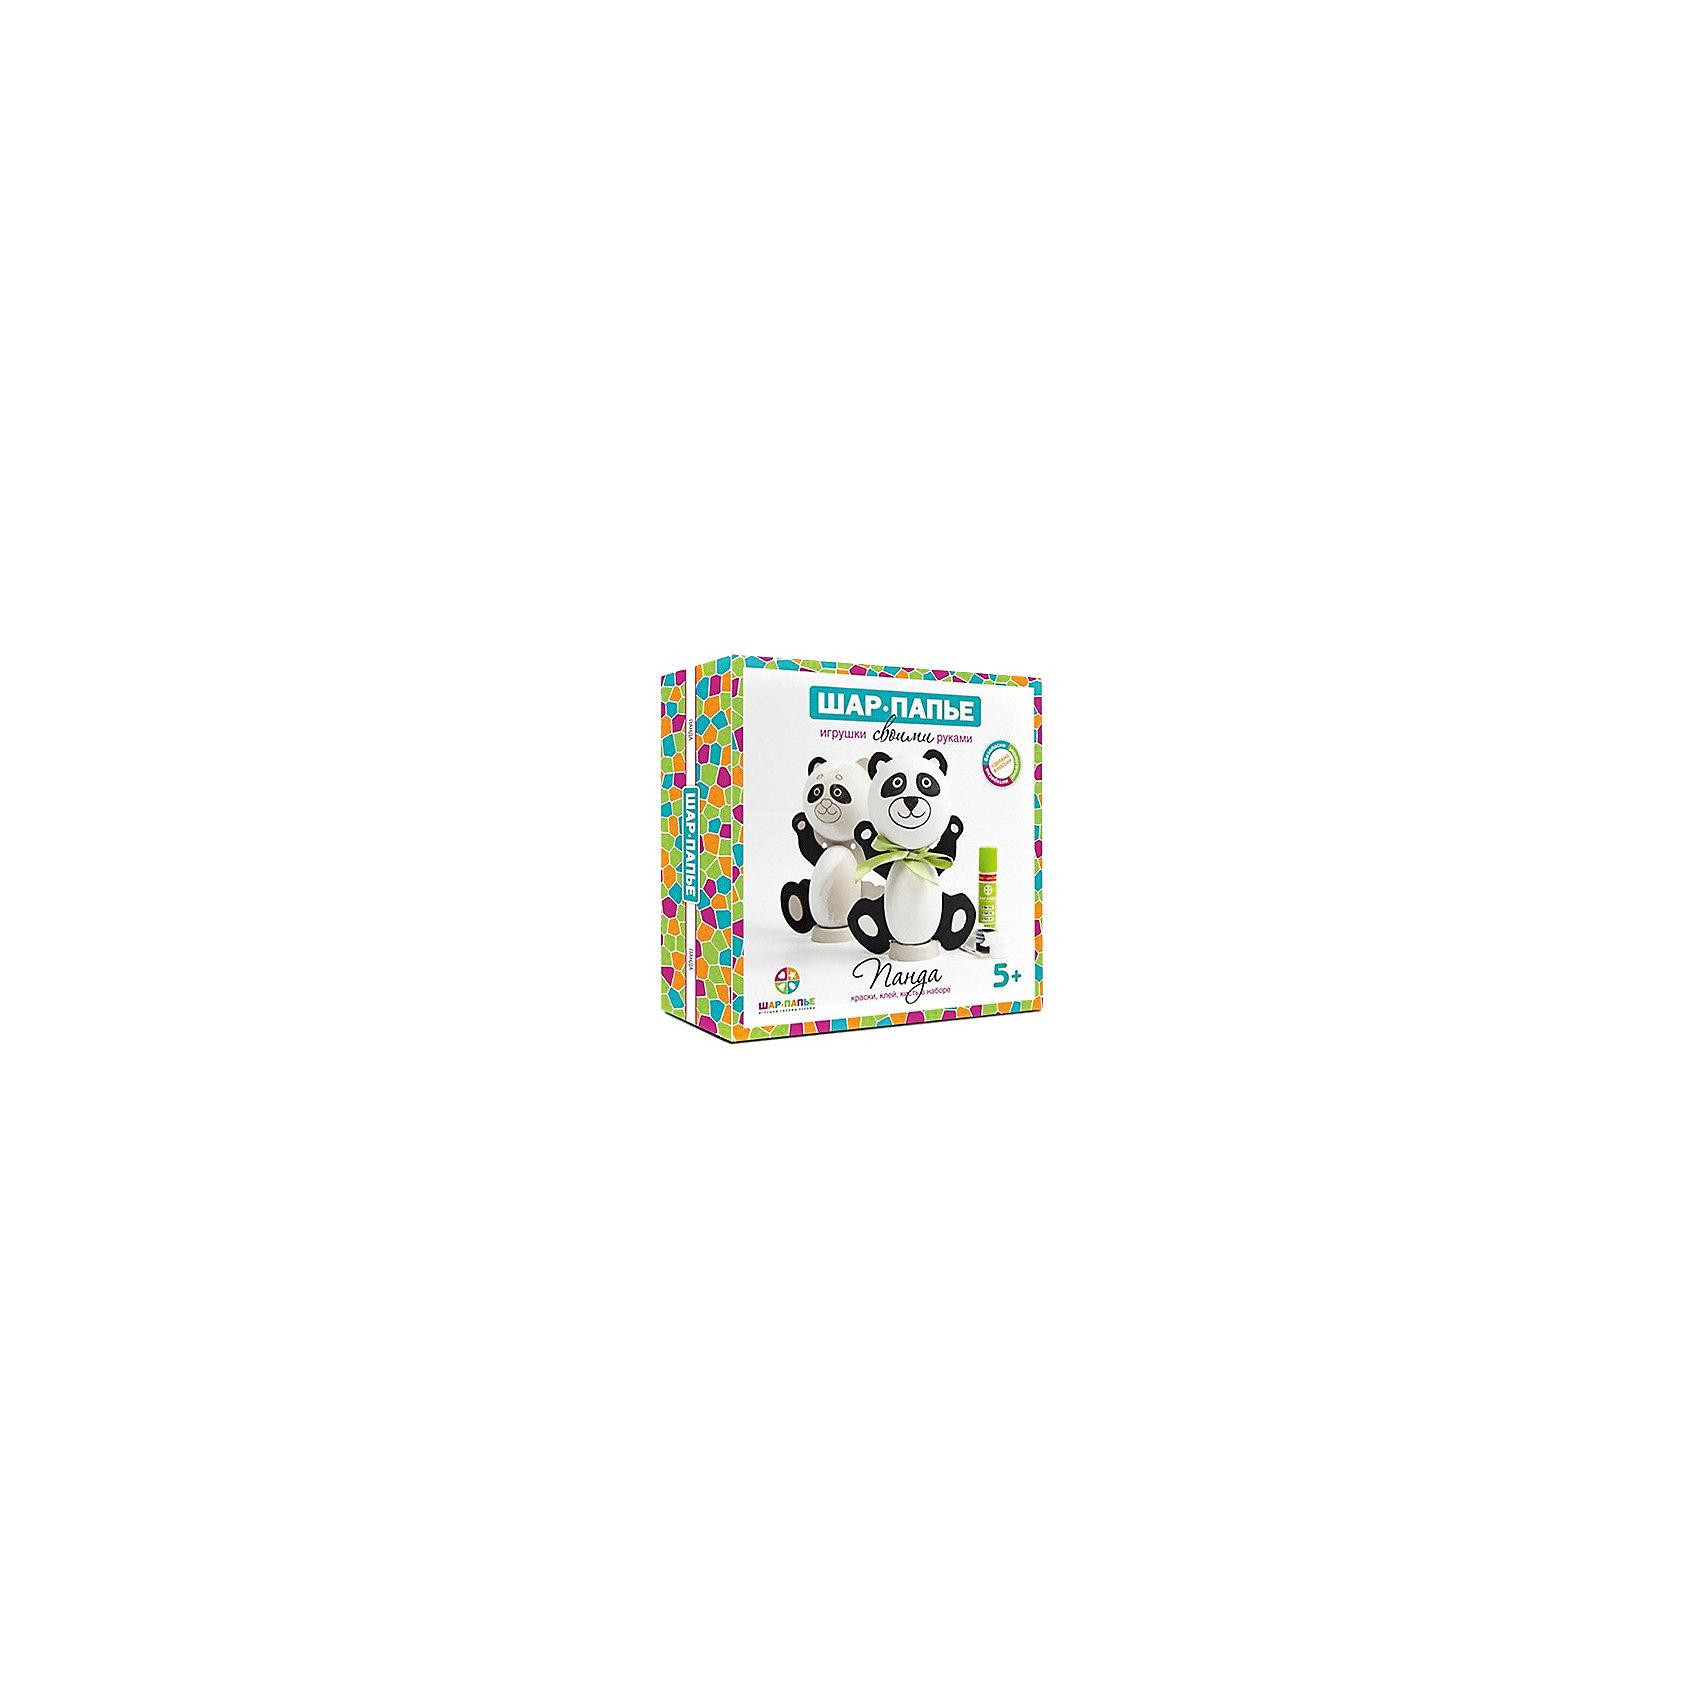 Шар Папье Набор для раскрашивания Панда из Шар-Папье шар папье набор для раскрашивания панда из шар папье